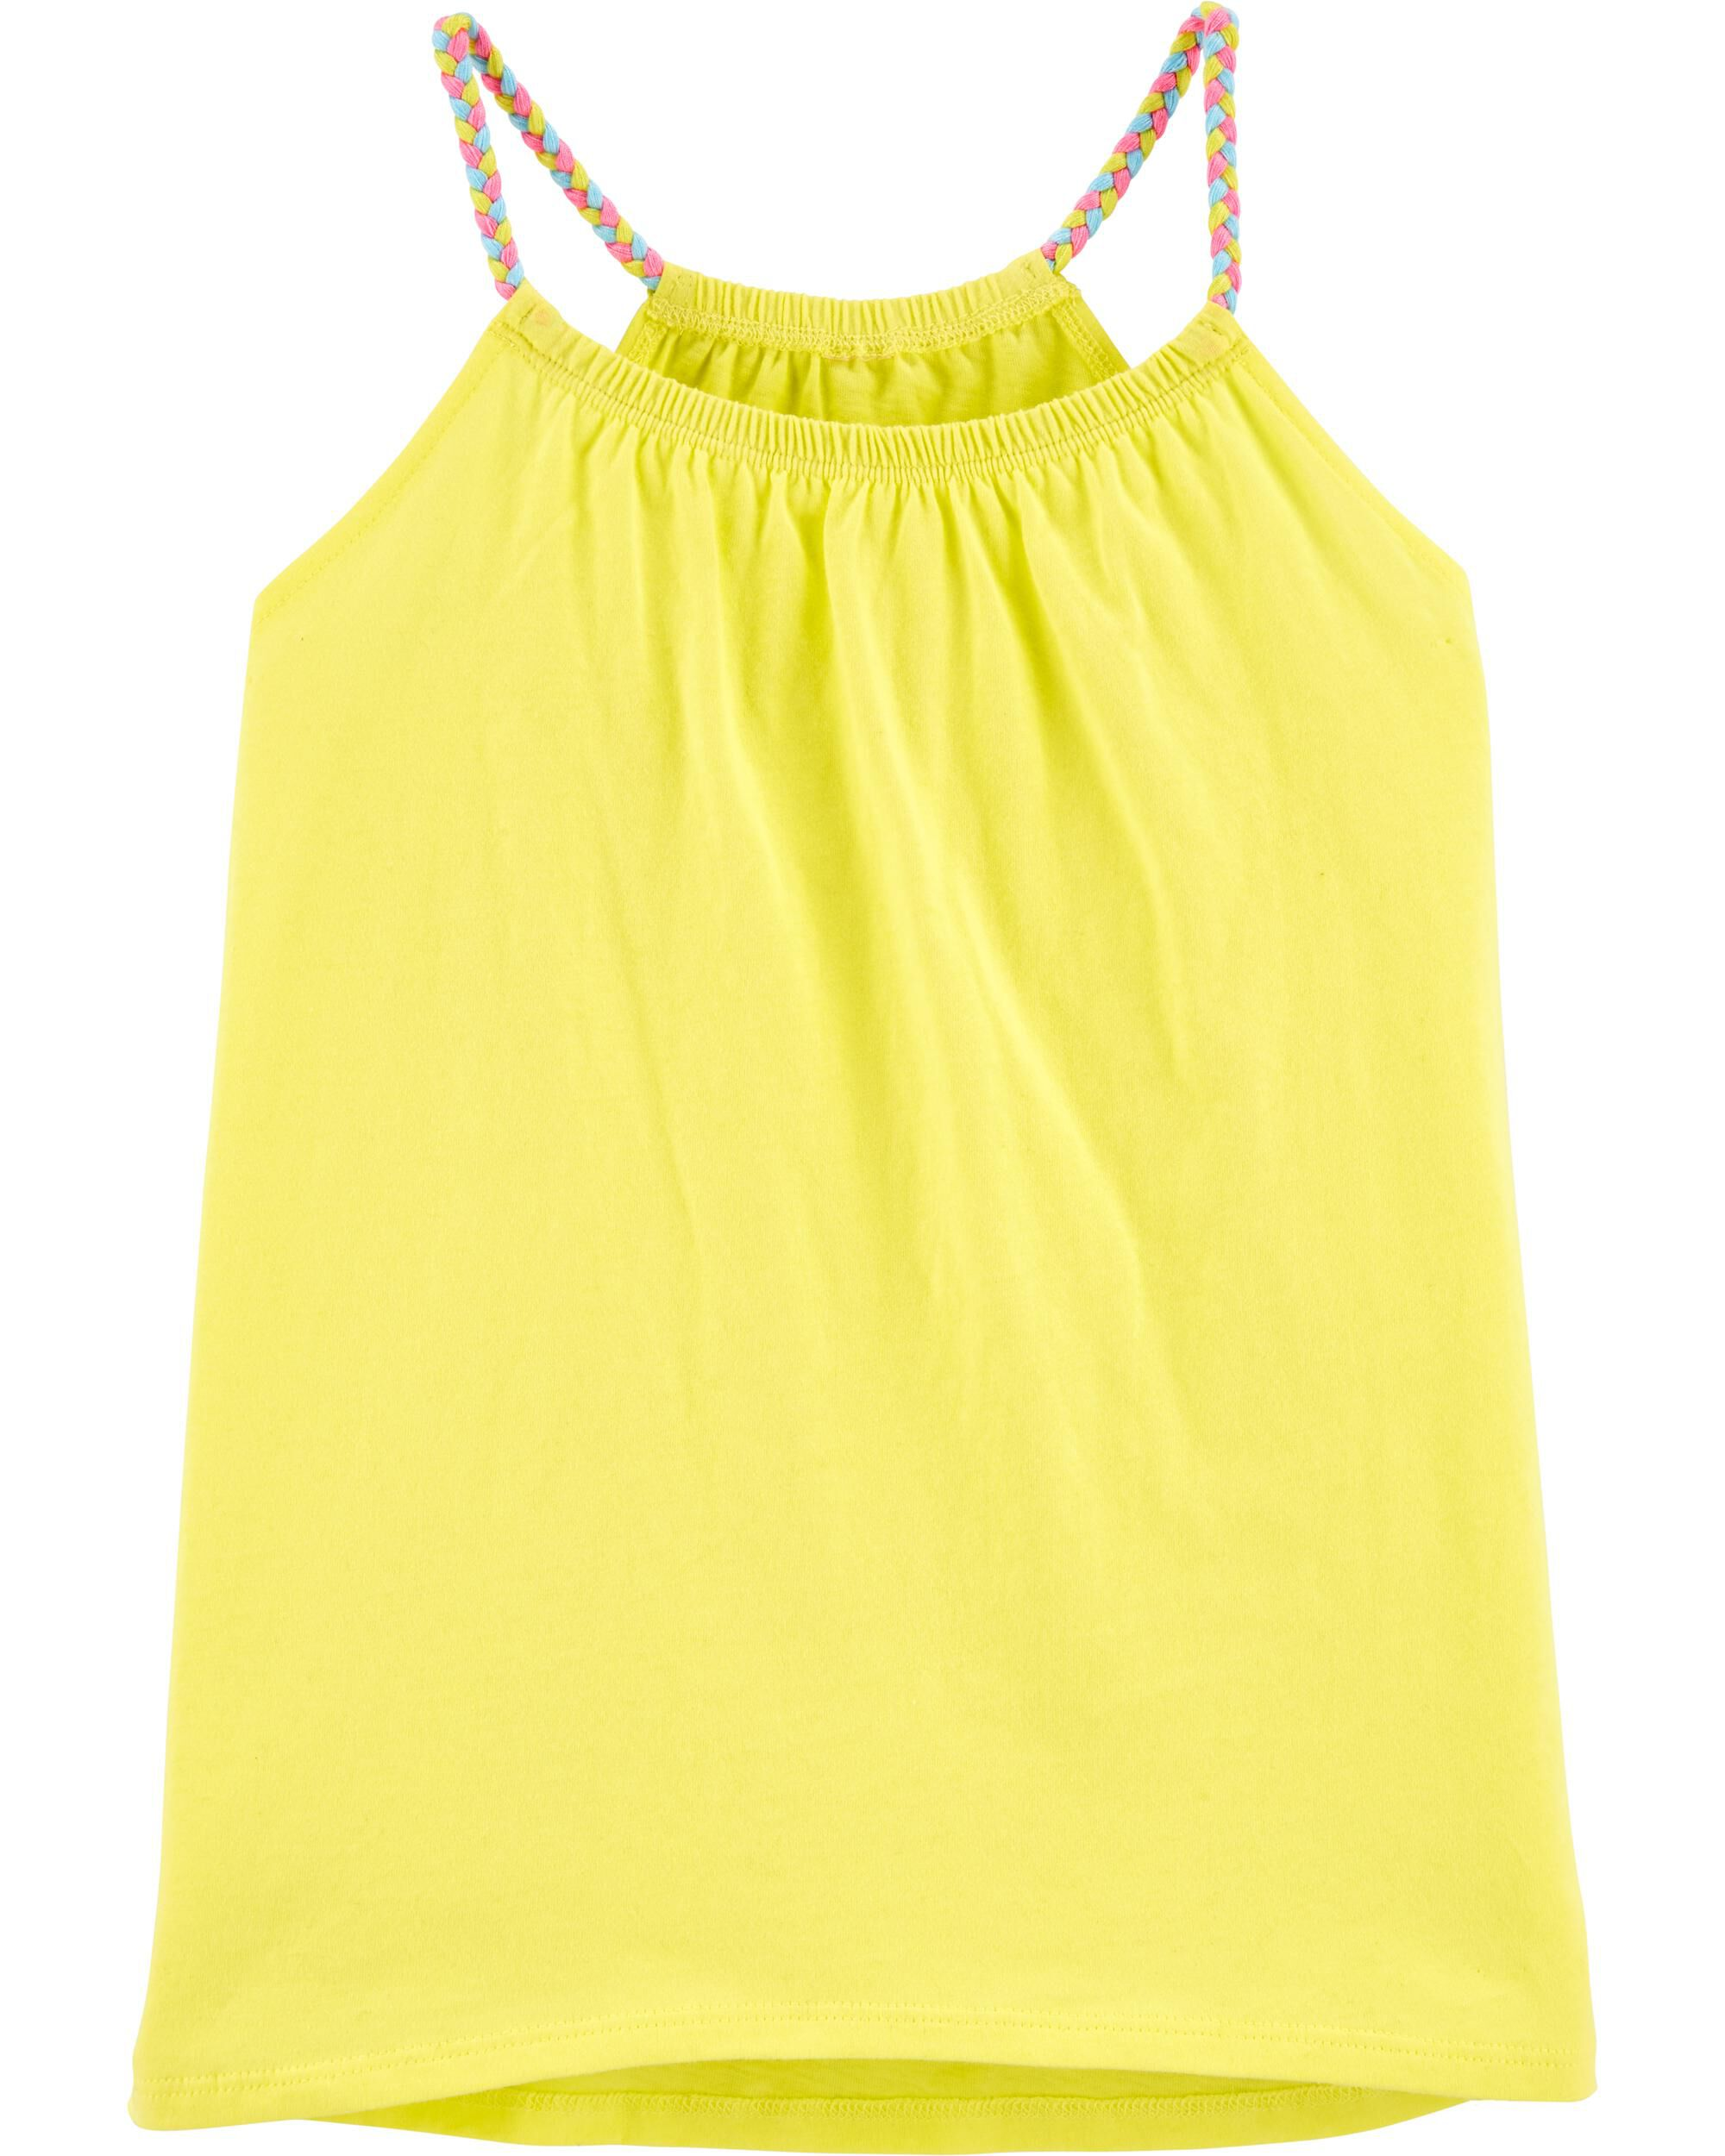 Girls 2 LOT STRAWBERRY SHORTCAKE TANK TOP Undershirt WHITE PInk Yellow SIZE 4